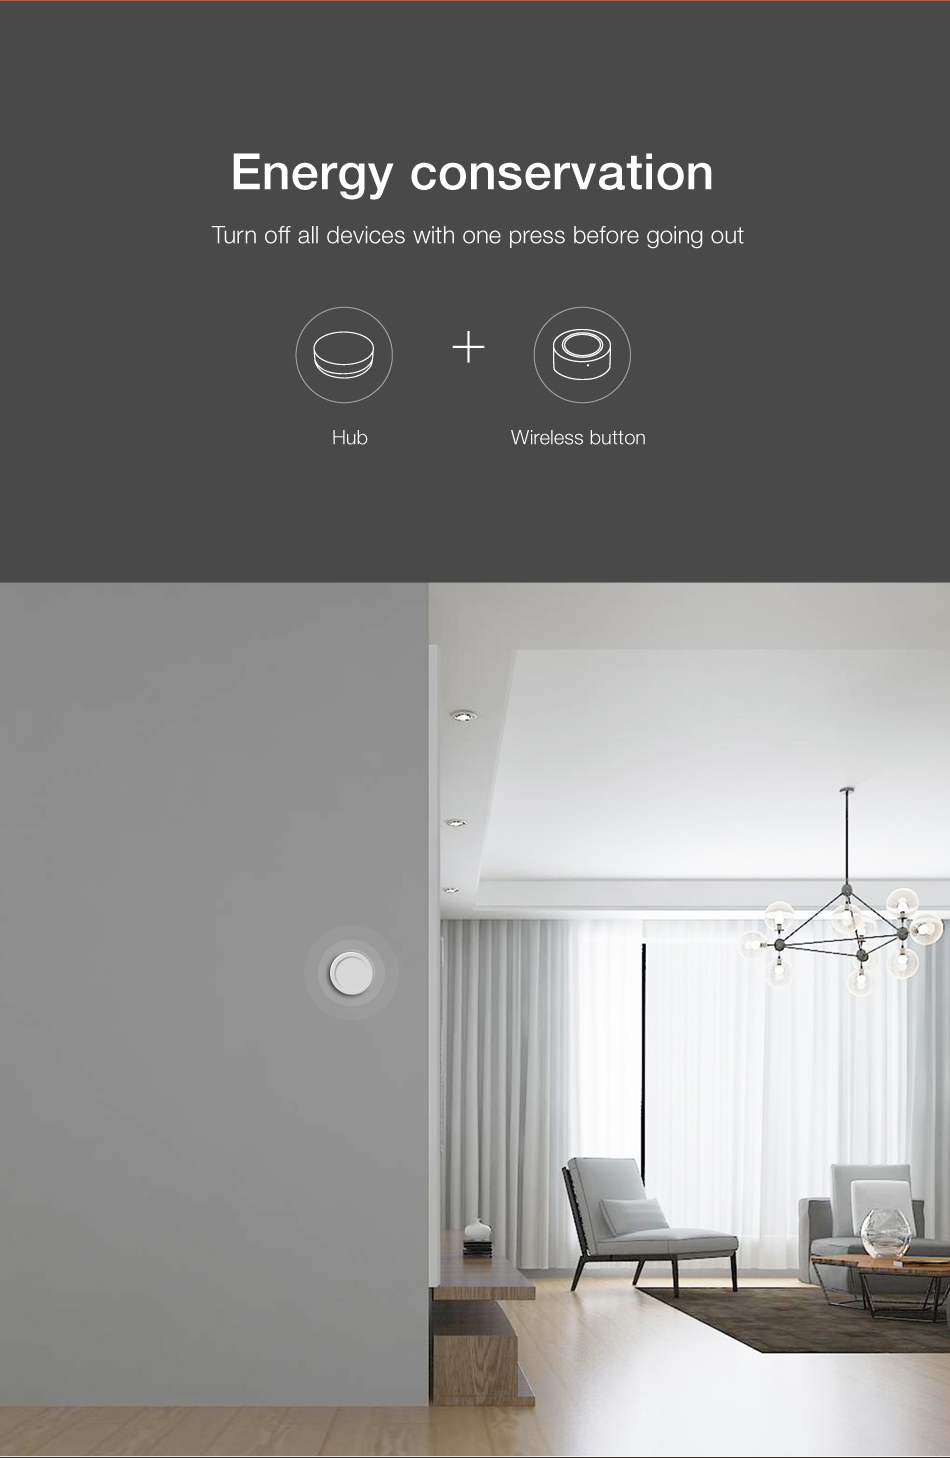 interruptor remoto casa inteligente sem fio aplicativo